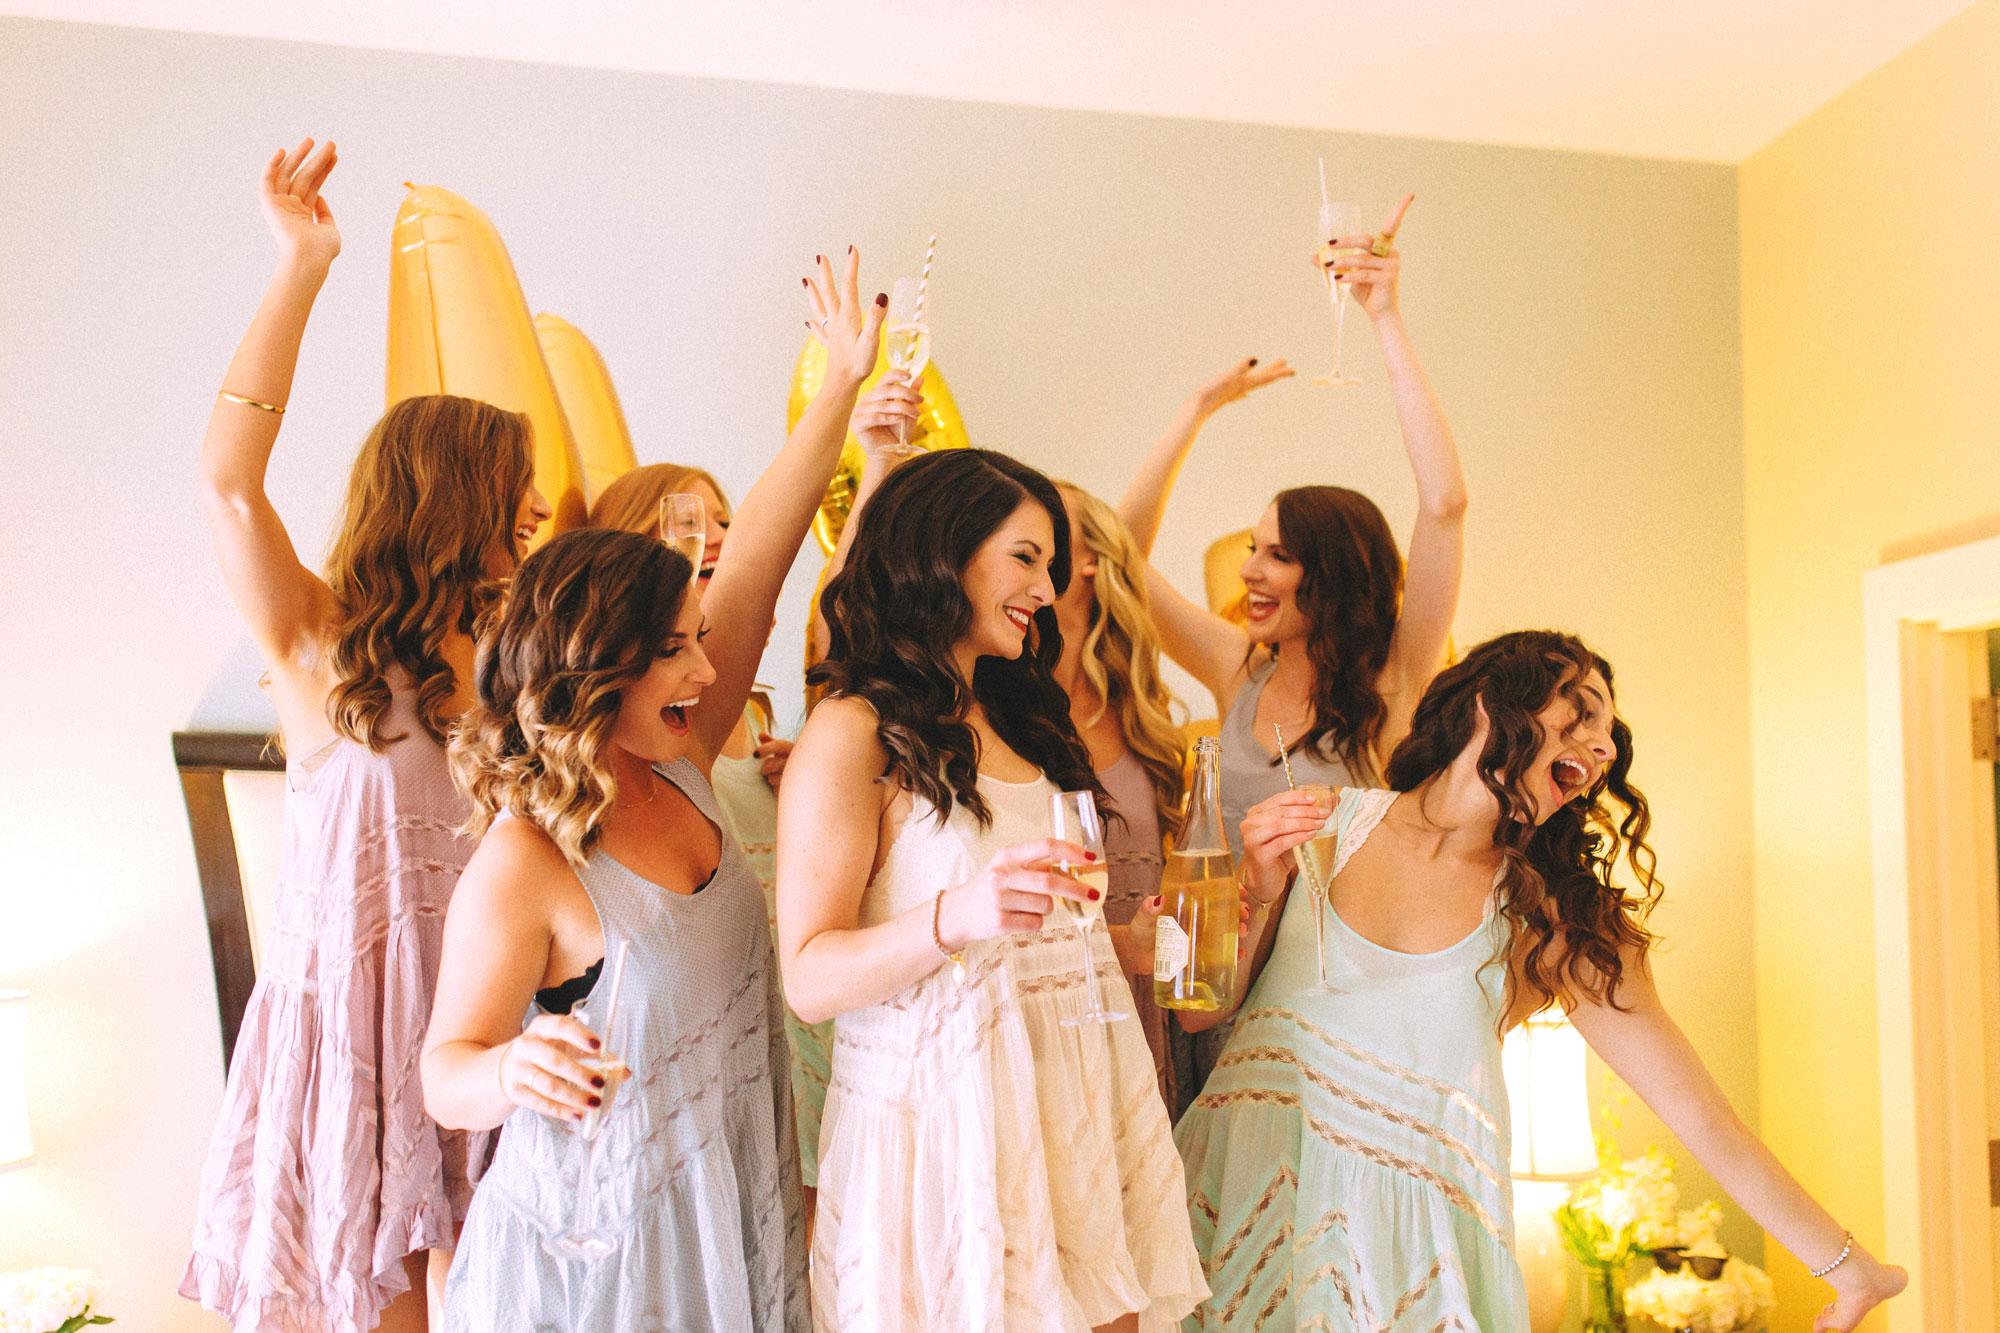 Me & Mr. Jones Wedding, Bridemaids Outfits, Free People Voile Trapeze Slip, Nashville Wedding, Union Station Hotel, Black Tie Wedding